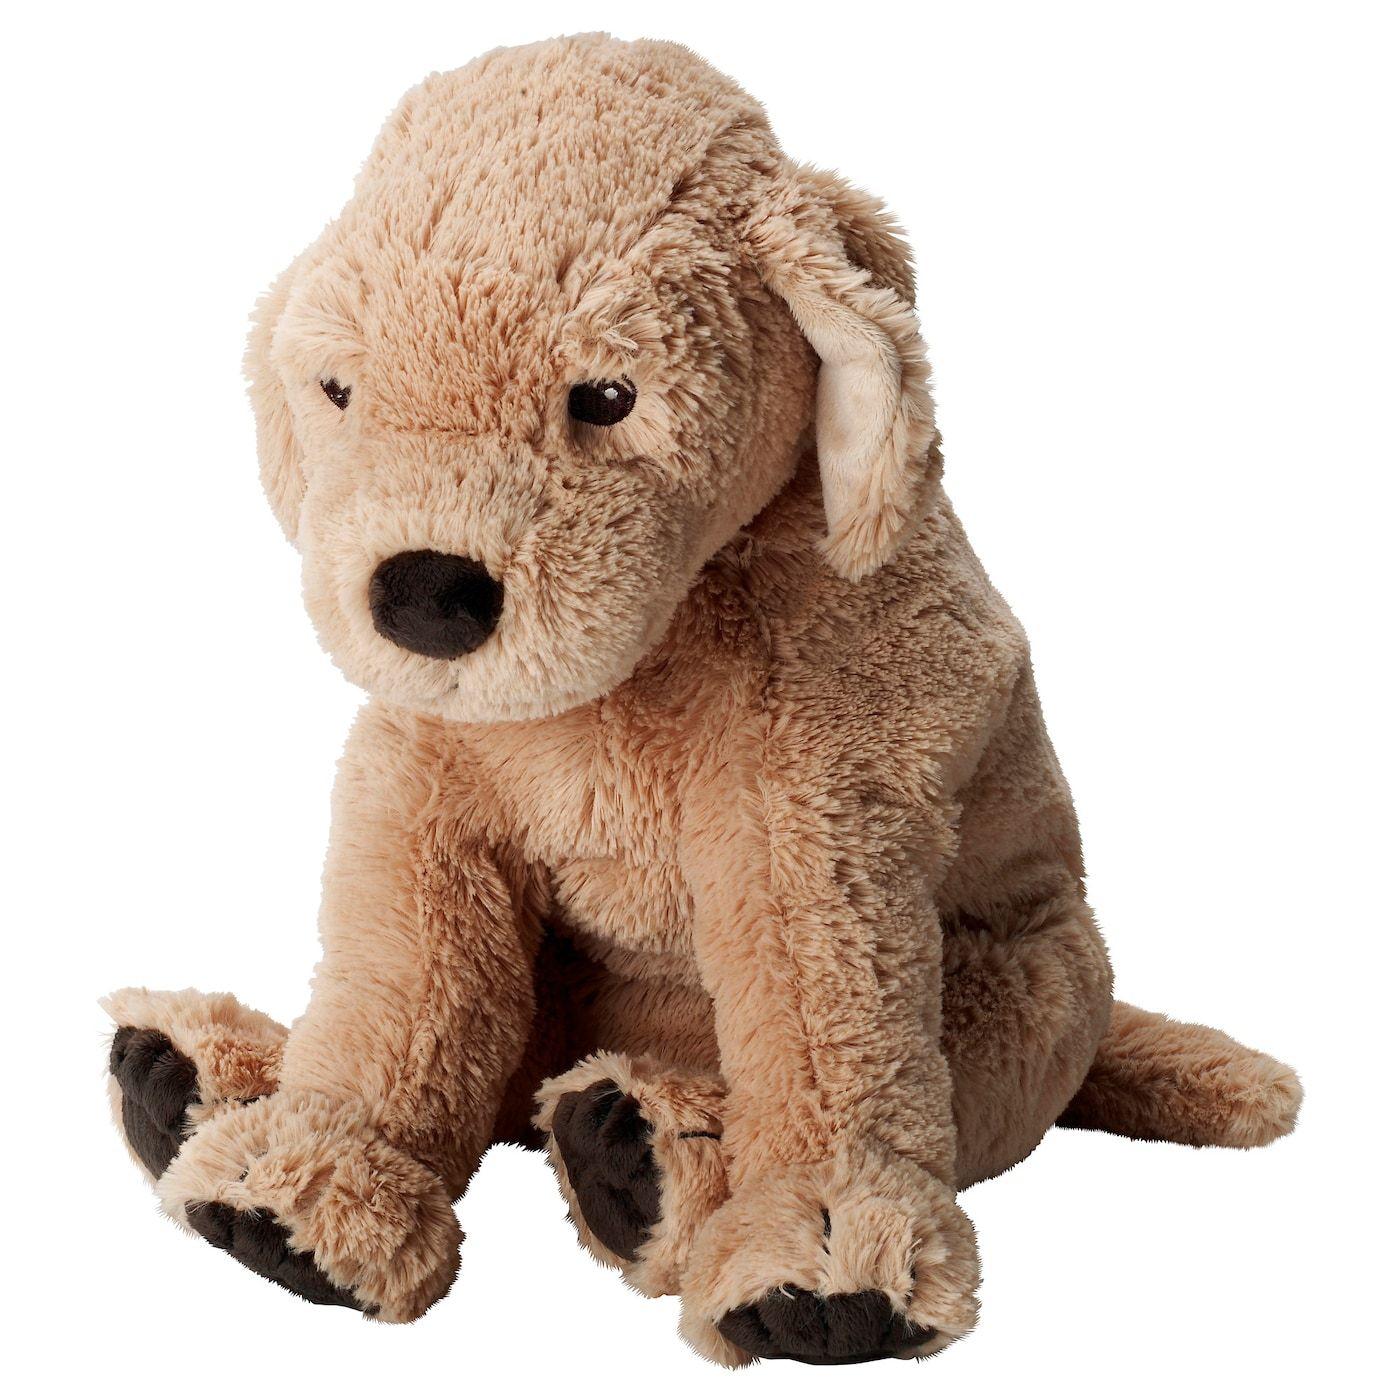 Gosig Golden Soft Toy Dog Golden Retriever 15 40 Cm Ikea Soft Toy Dog Soft Toy Animals Teddy Bear Stuffed Animal [ 1400 x 1400 Pixel ]